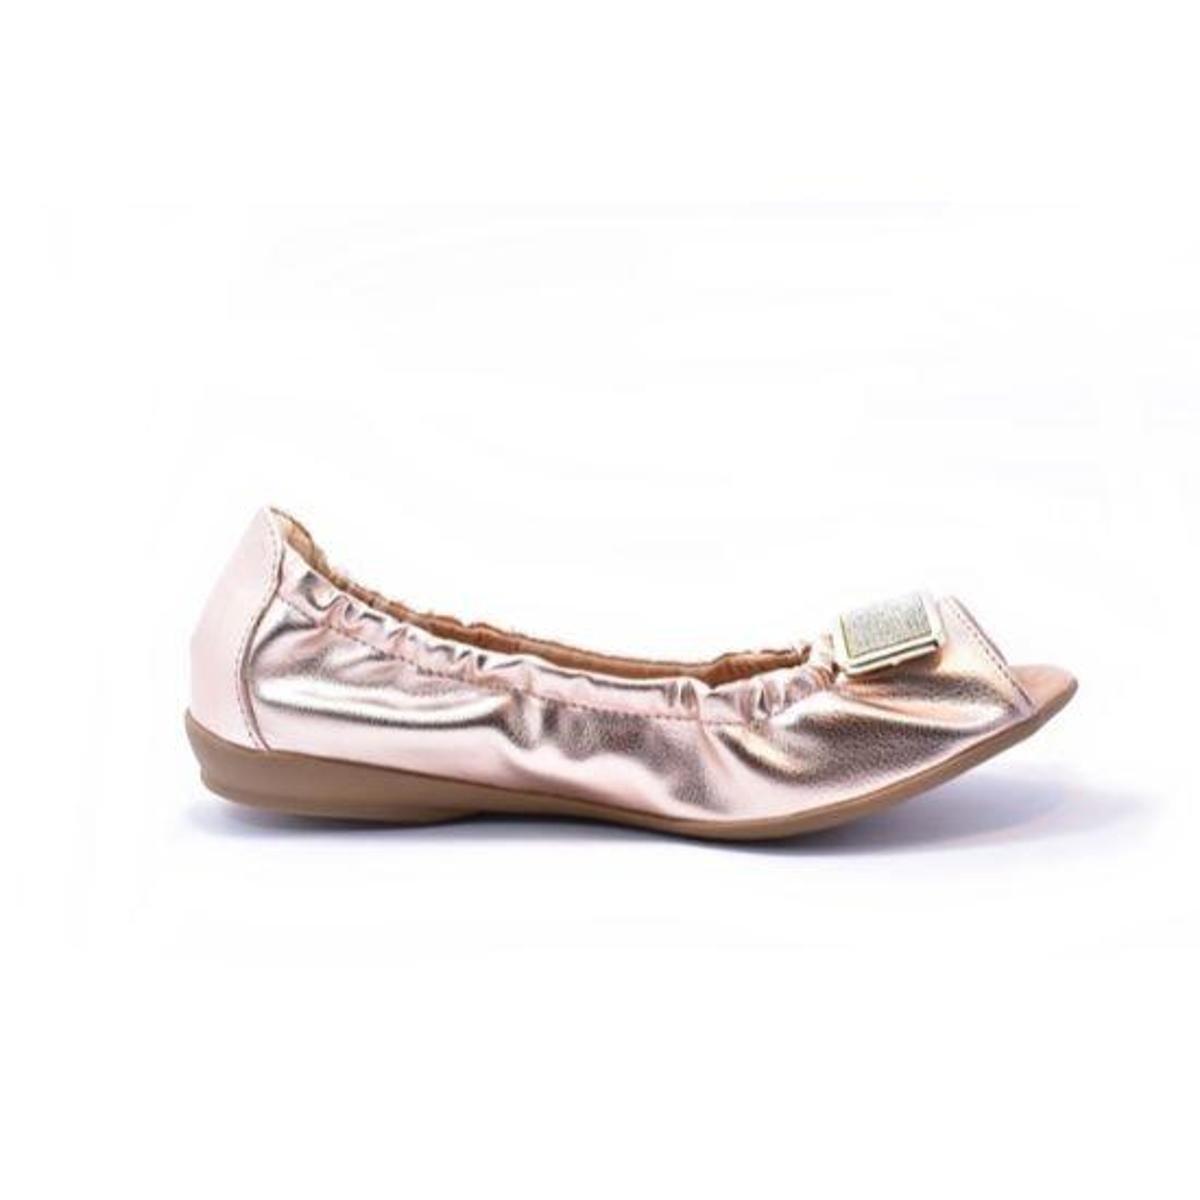 Sapatilha feminina tamanho grande peep toe renata della